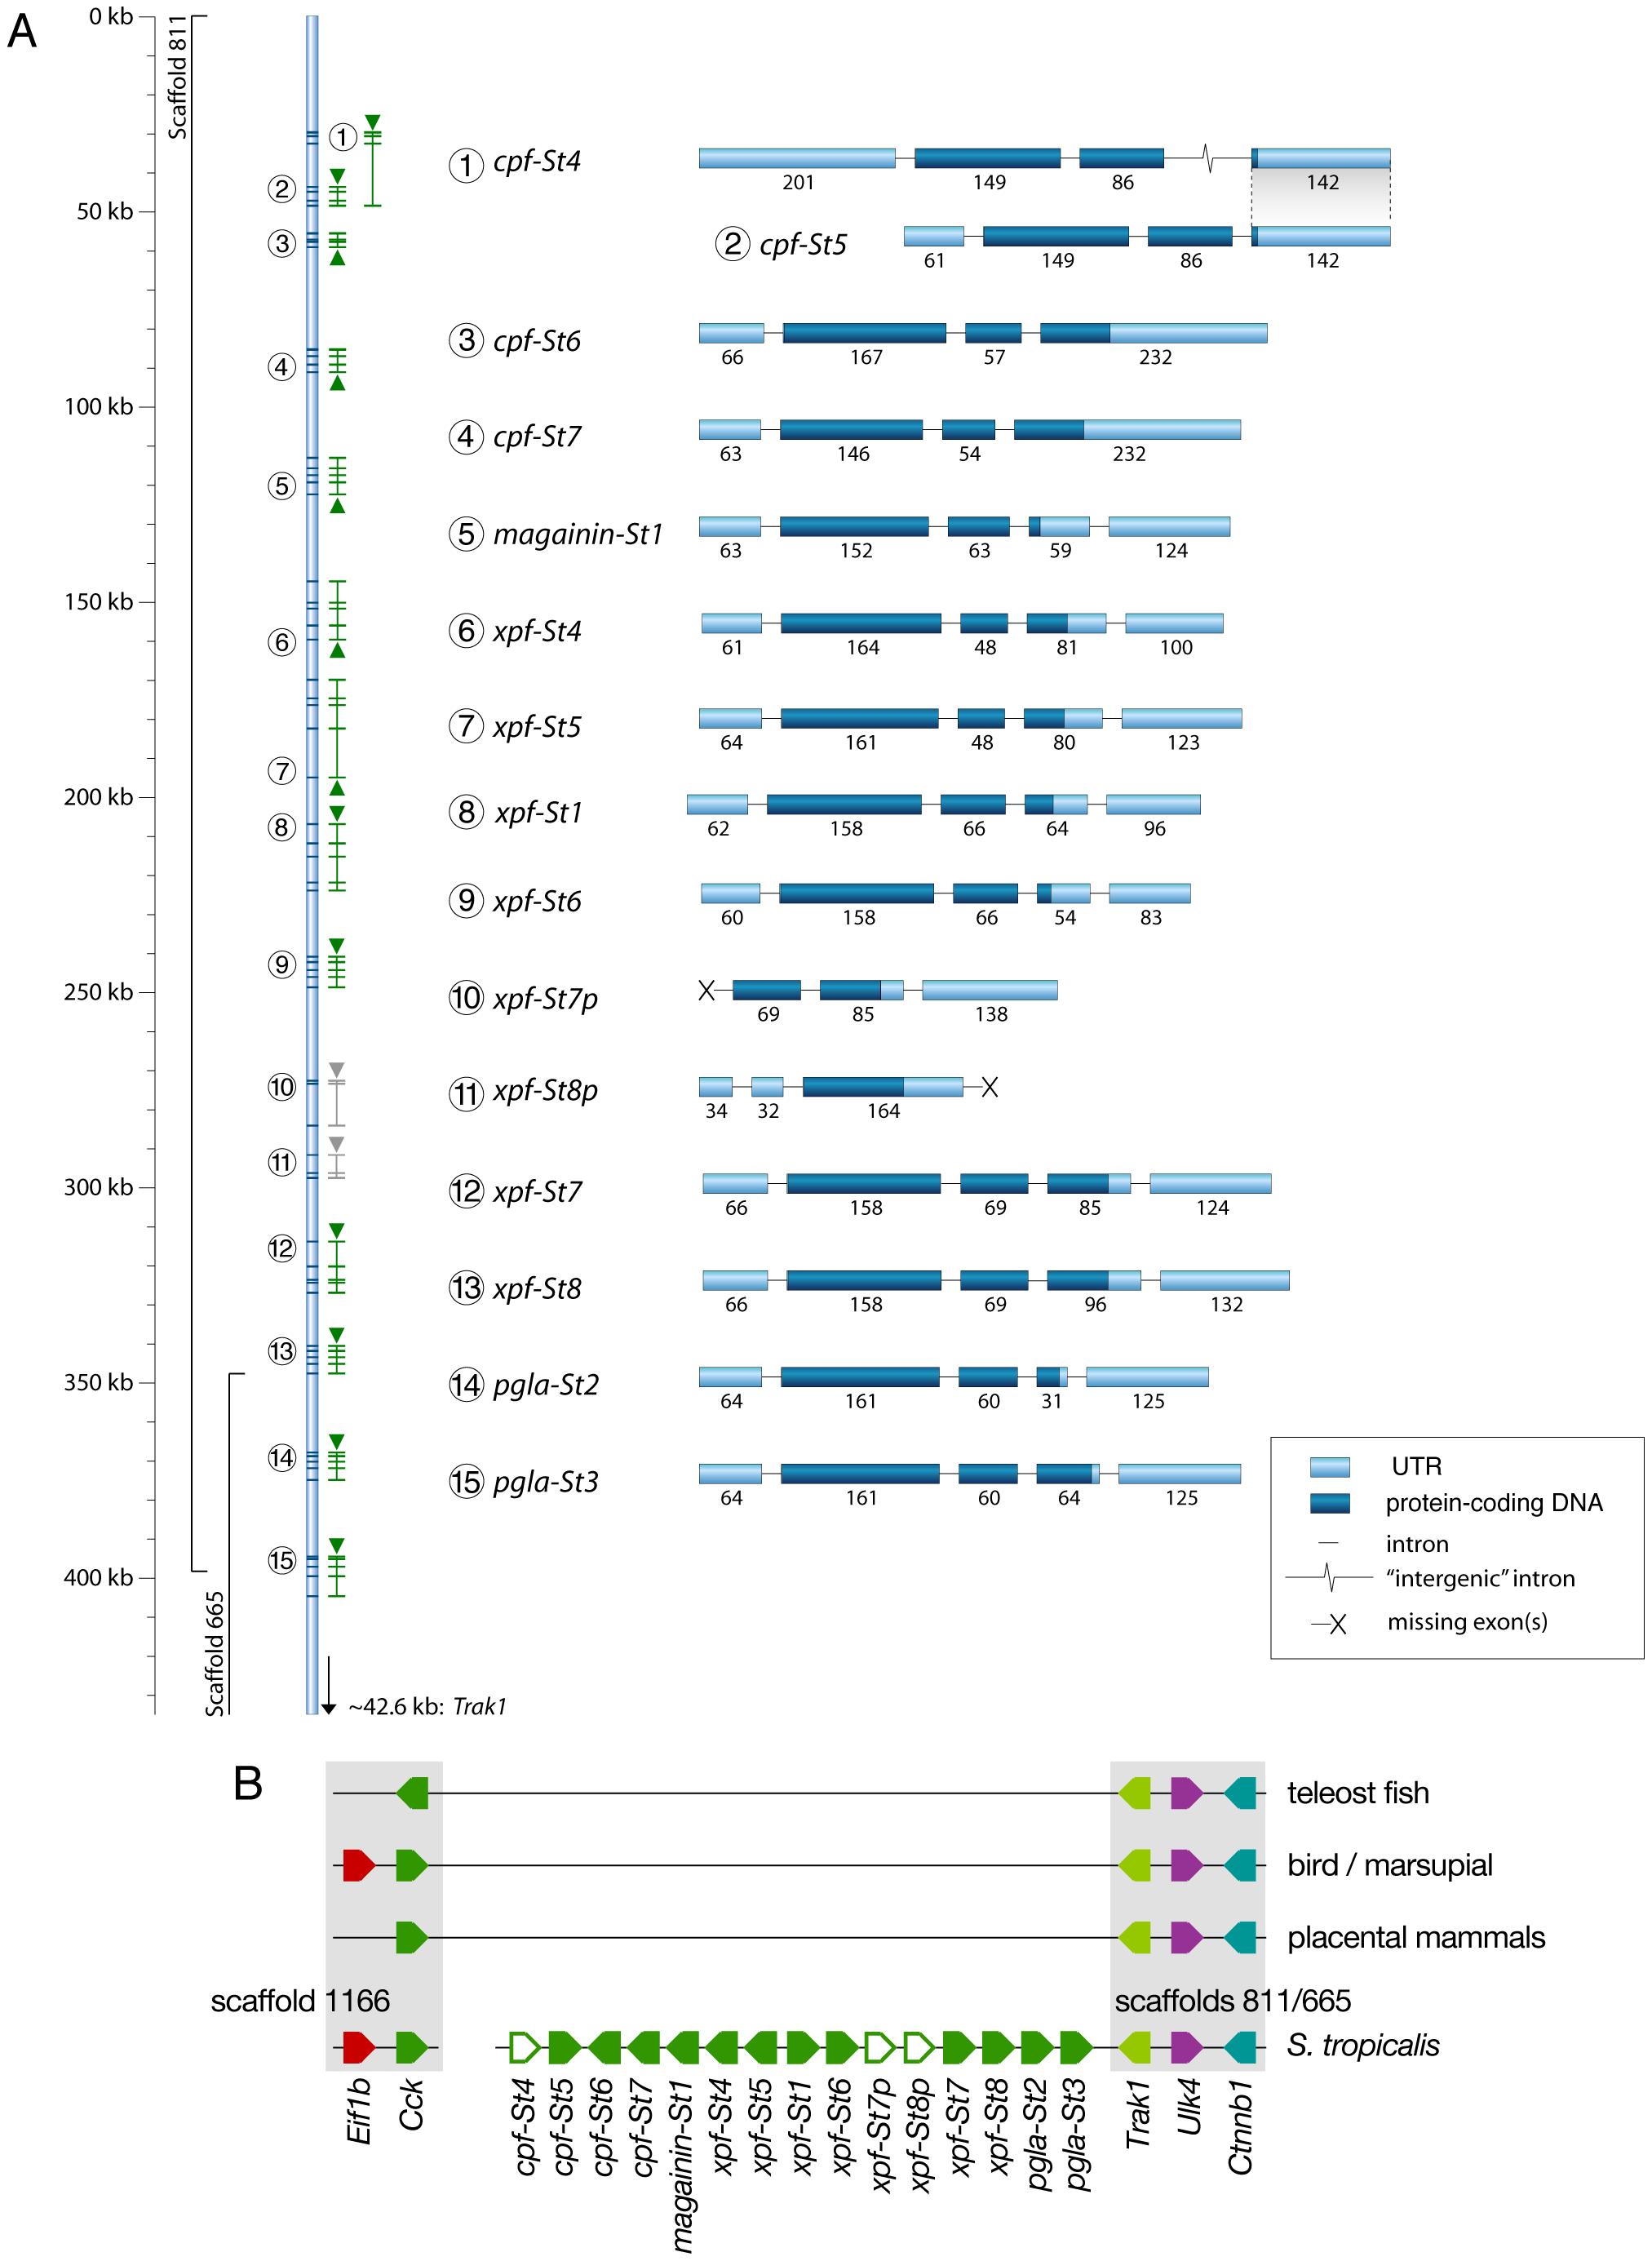 Genomic organization of the <i>Silurana tropicalis</i> AMP gene repertoire.